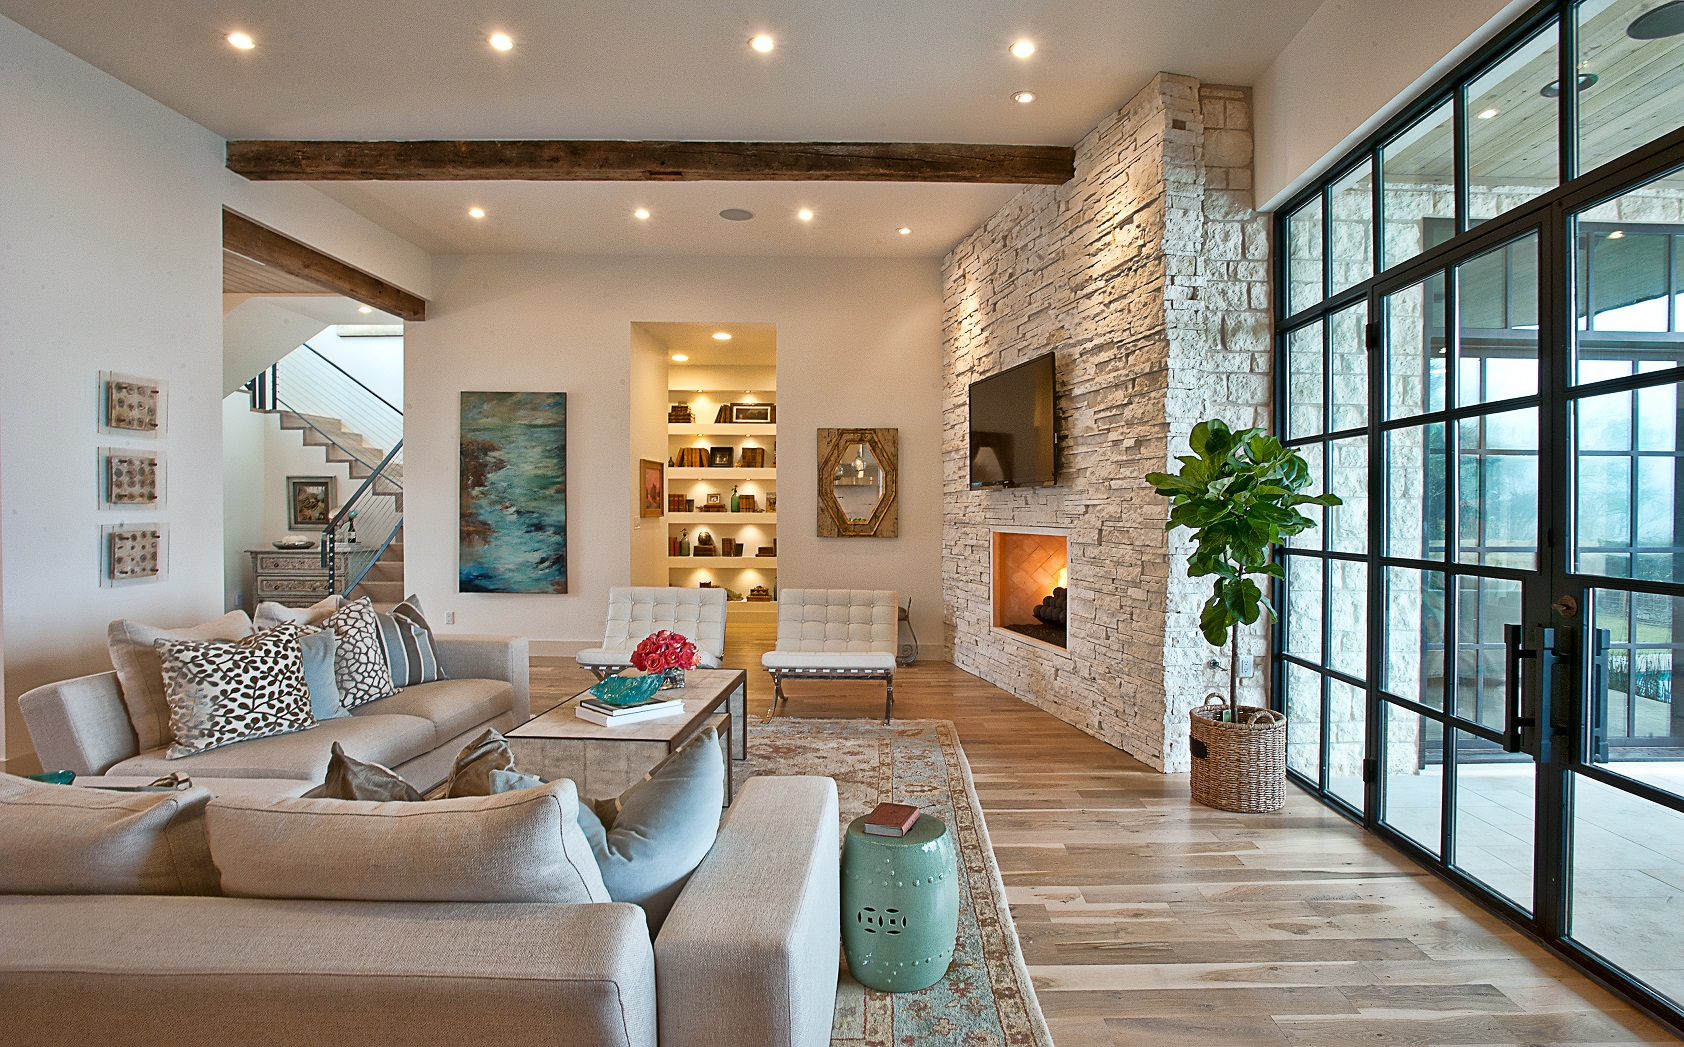 CatMountain-living room-glass